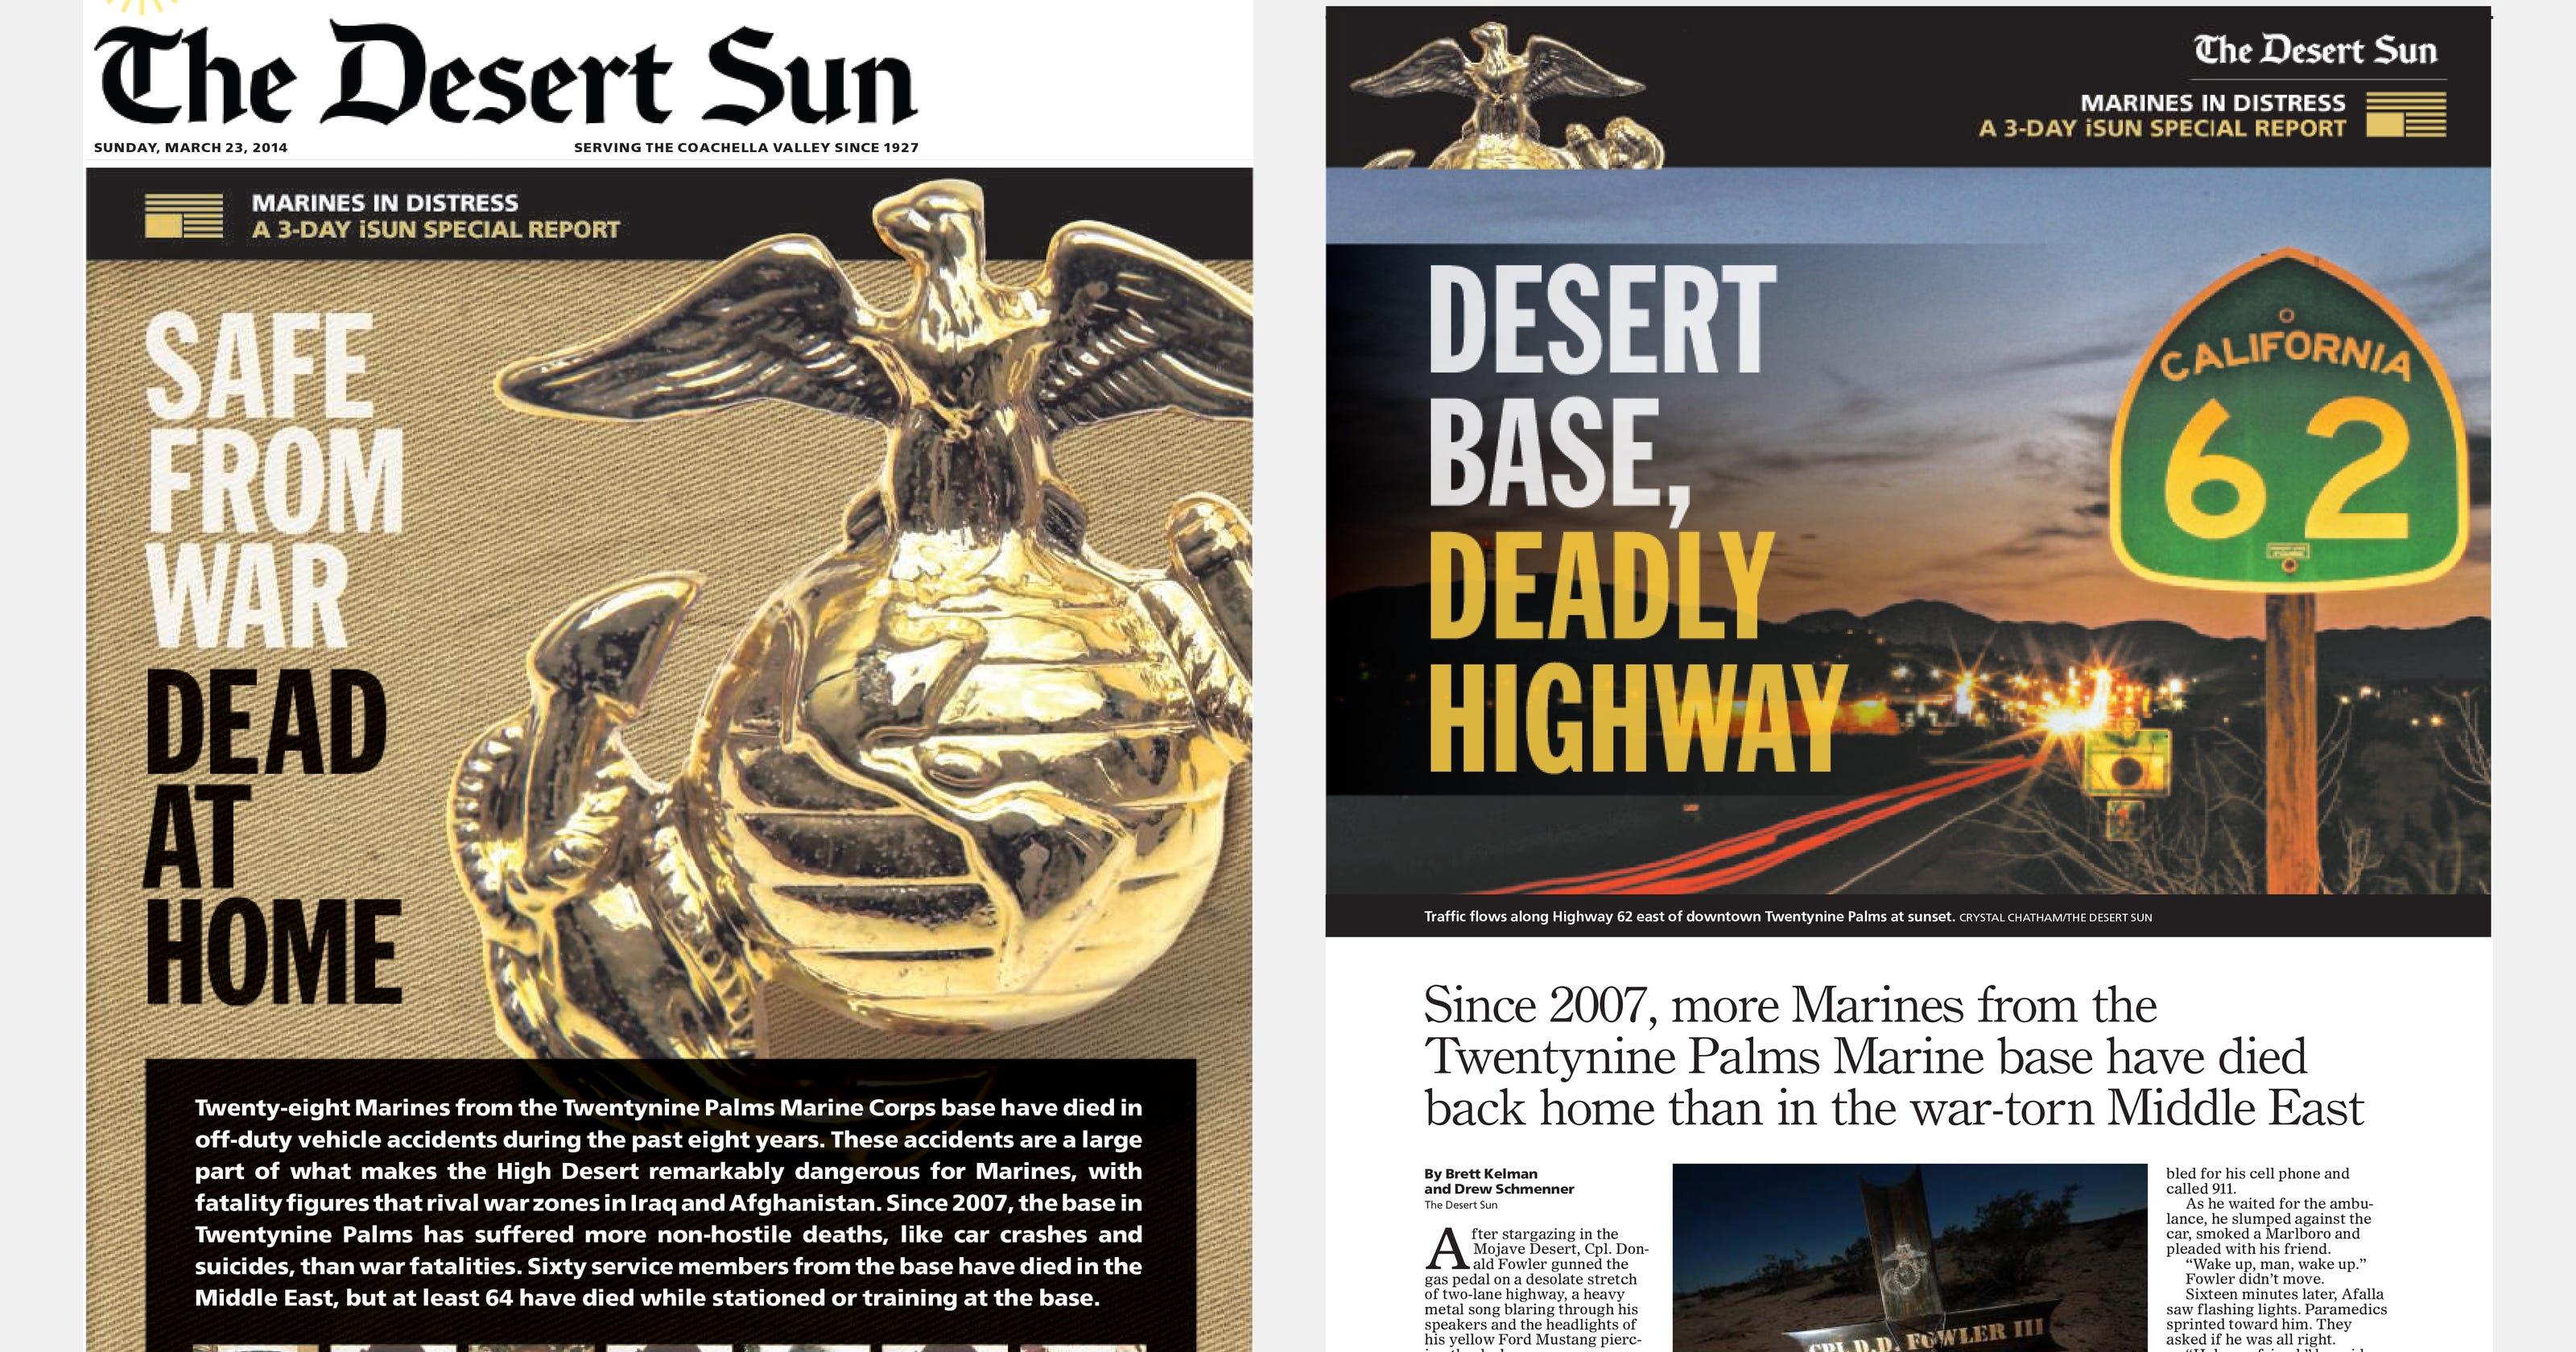 Marines in Twentynine Palms: More die at home than in Middle East